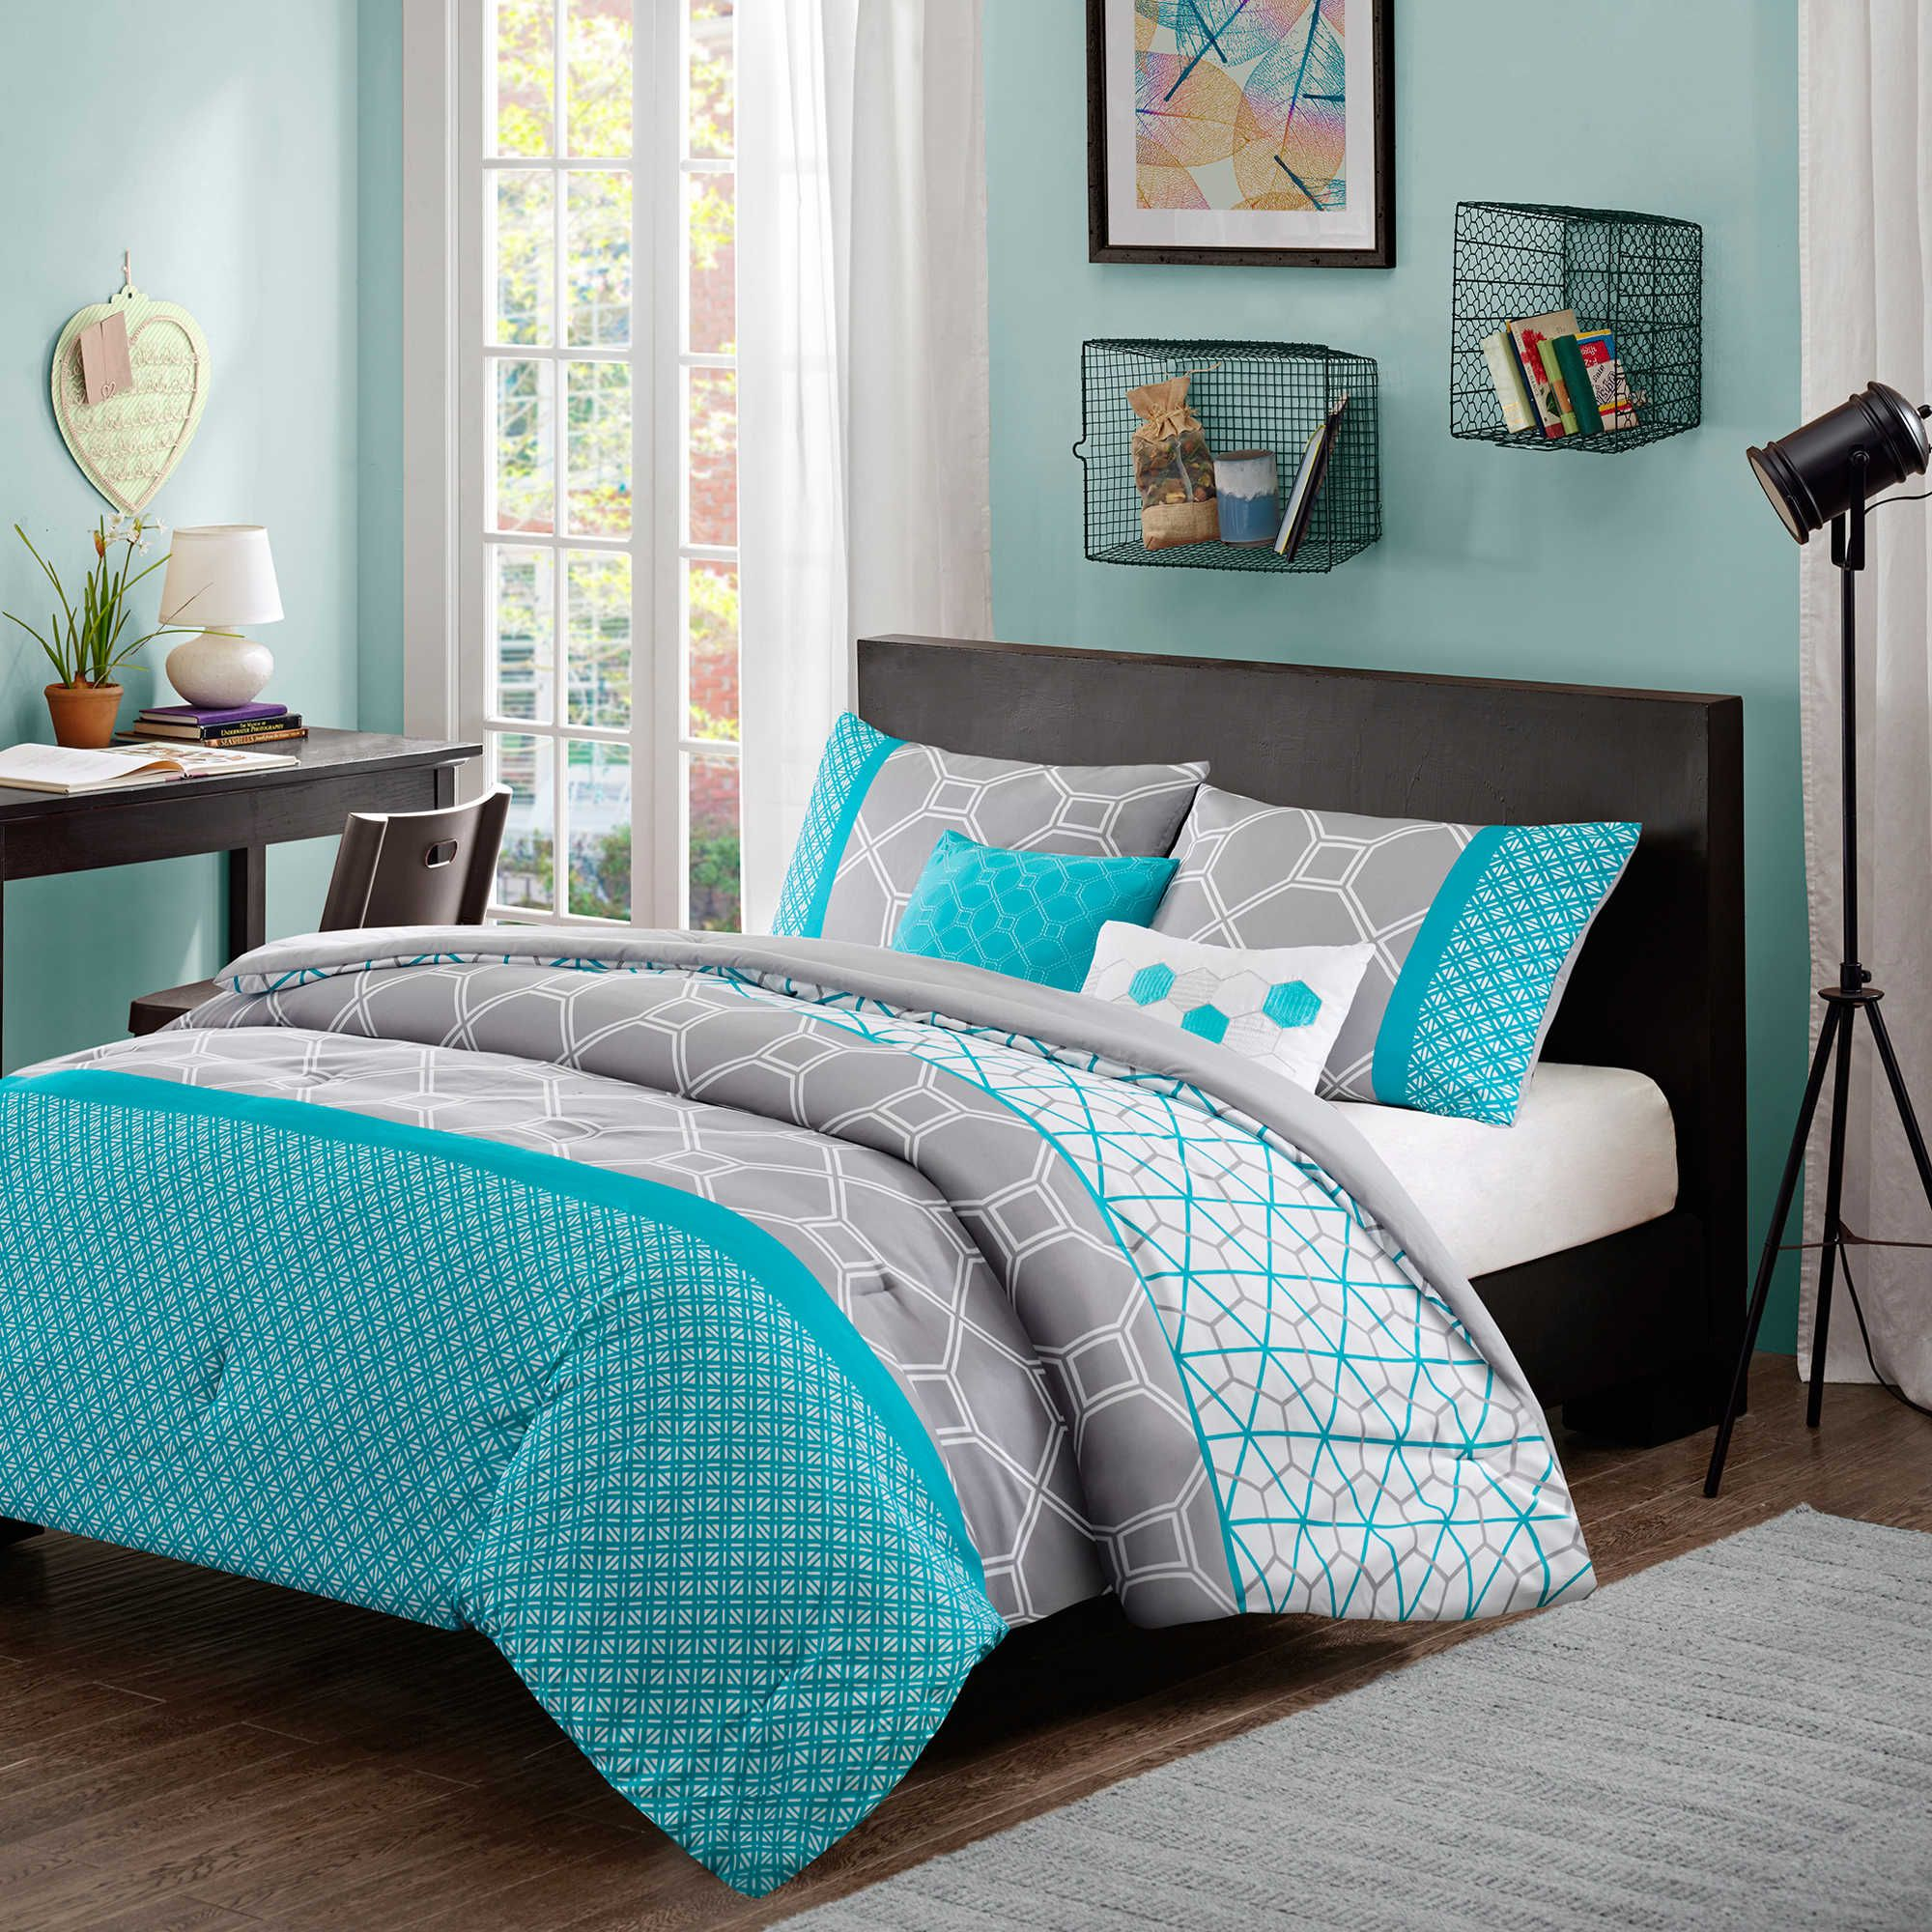 bedding sets home set xl ebay apartment twin chelsea comforter essence itm